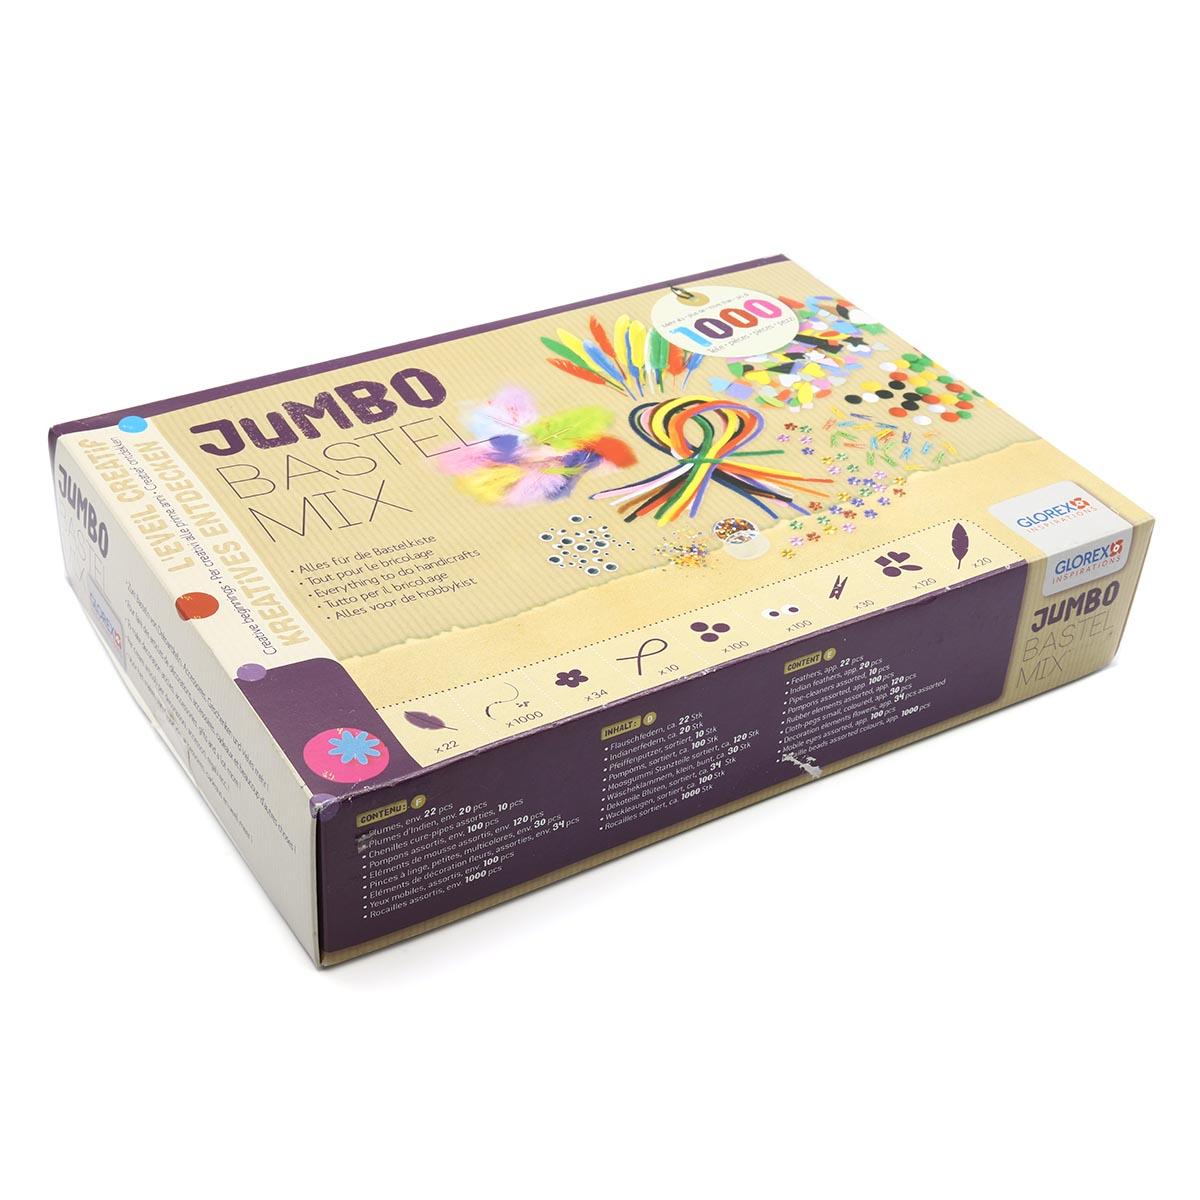 61214072 Набор Jumbo Bastel Mix Glorex